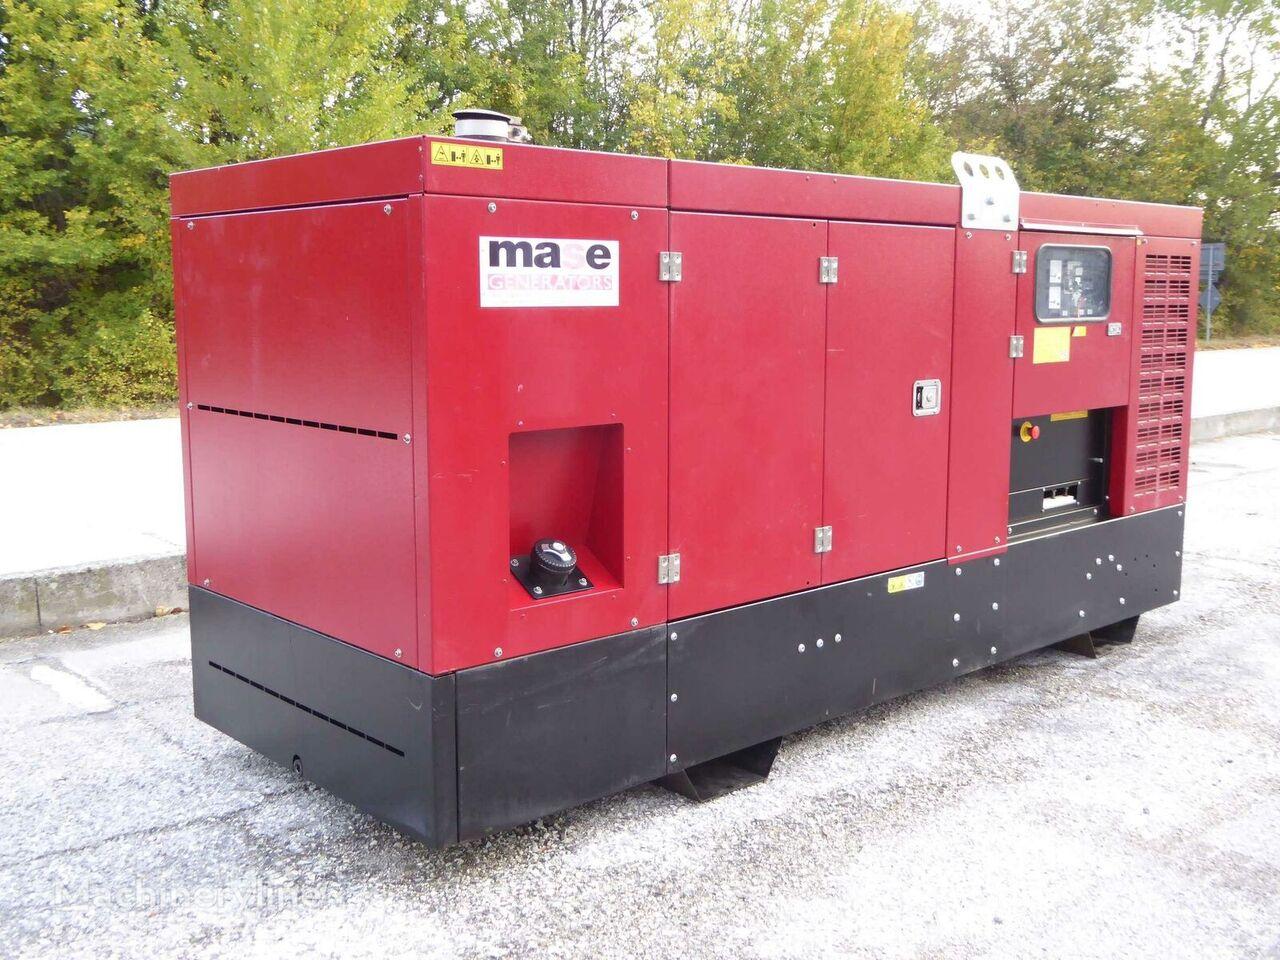 Mase MPL 137 S diesel generator